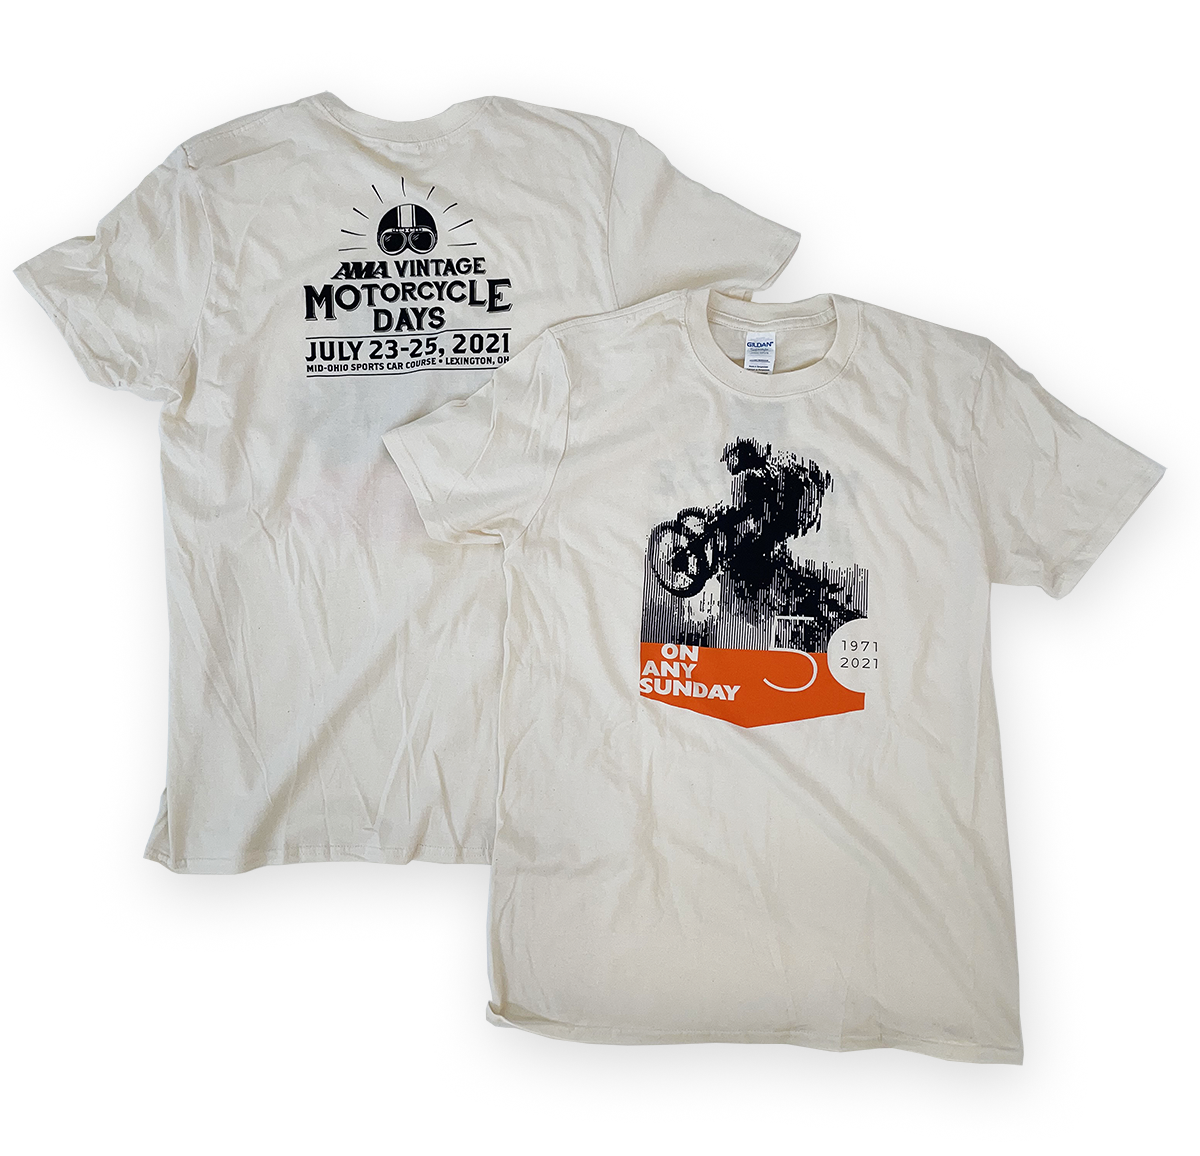 2021 AMA Vintage Motorcycle Days Tee